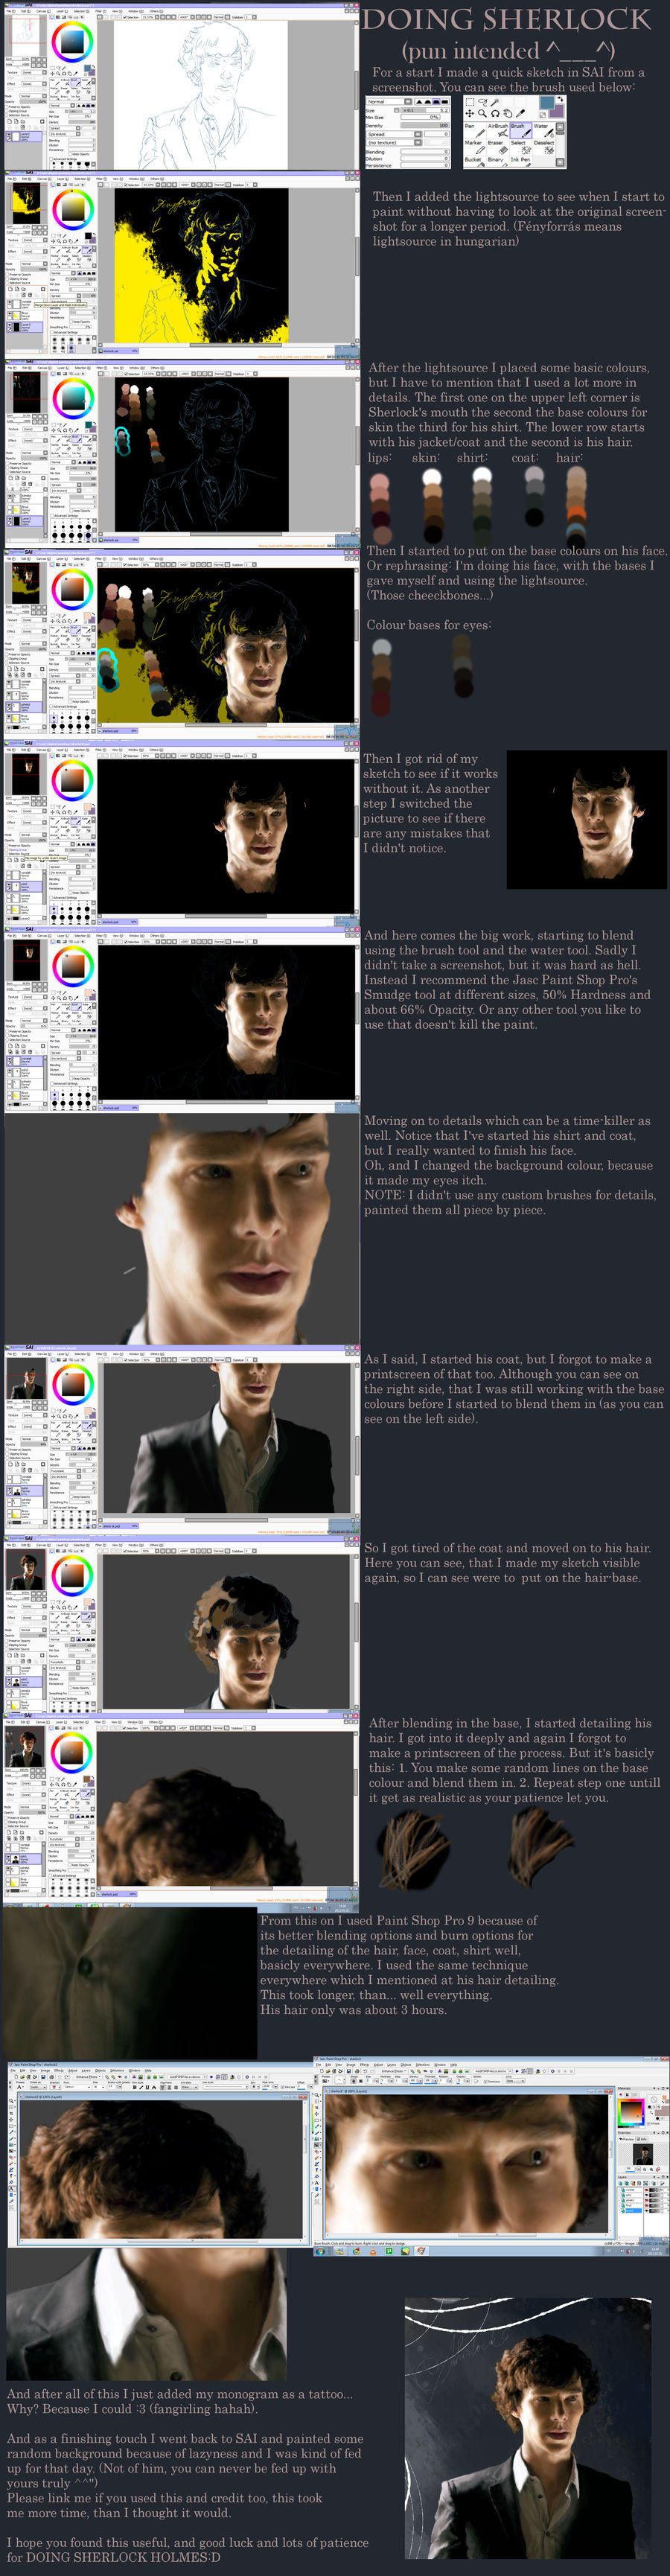 Sherlock-tutorial